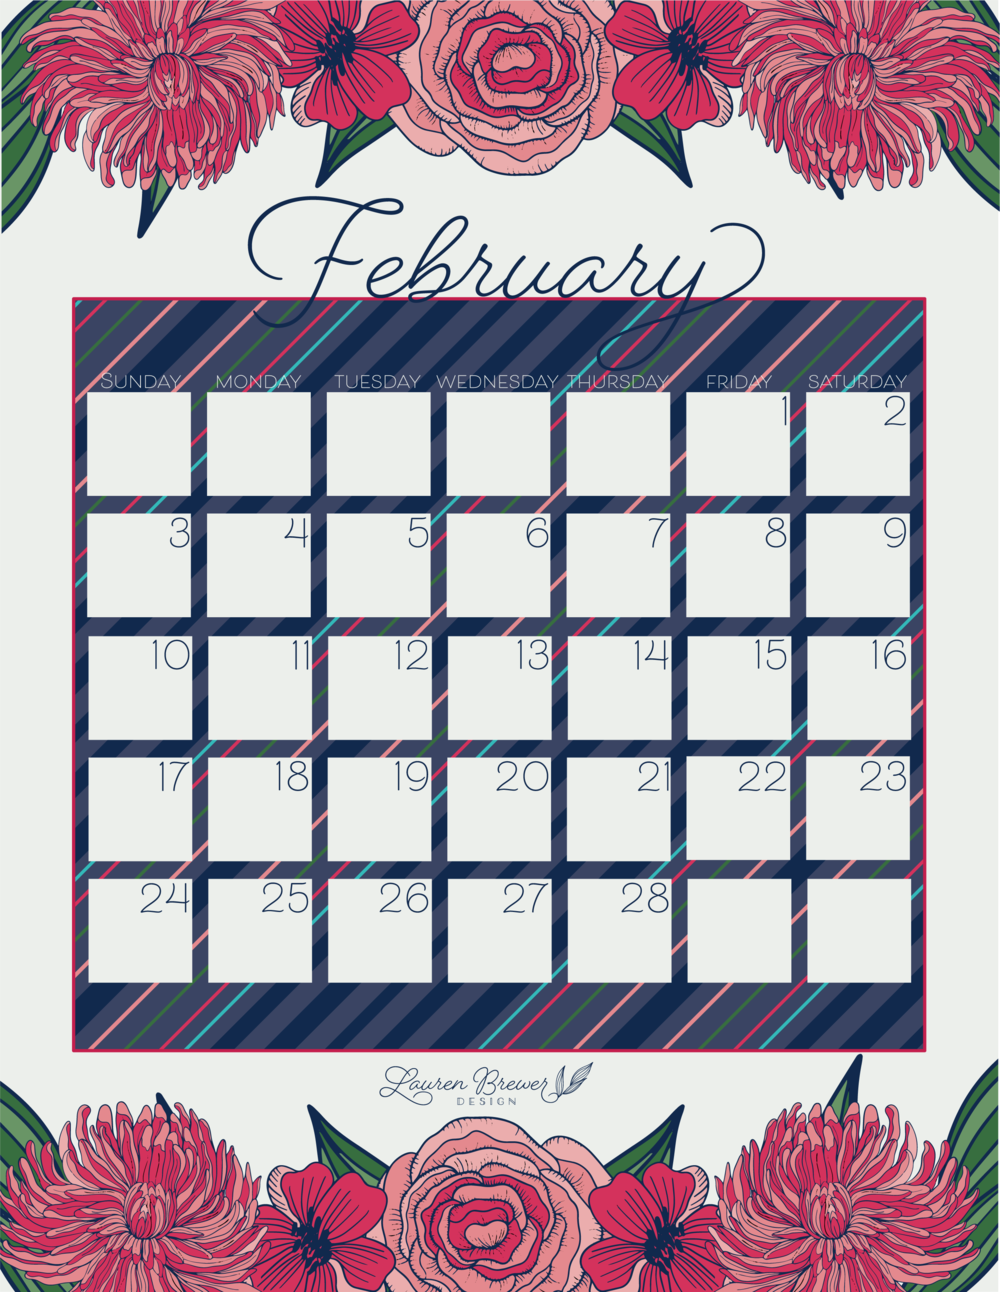 LBD February Calendar